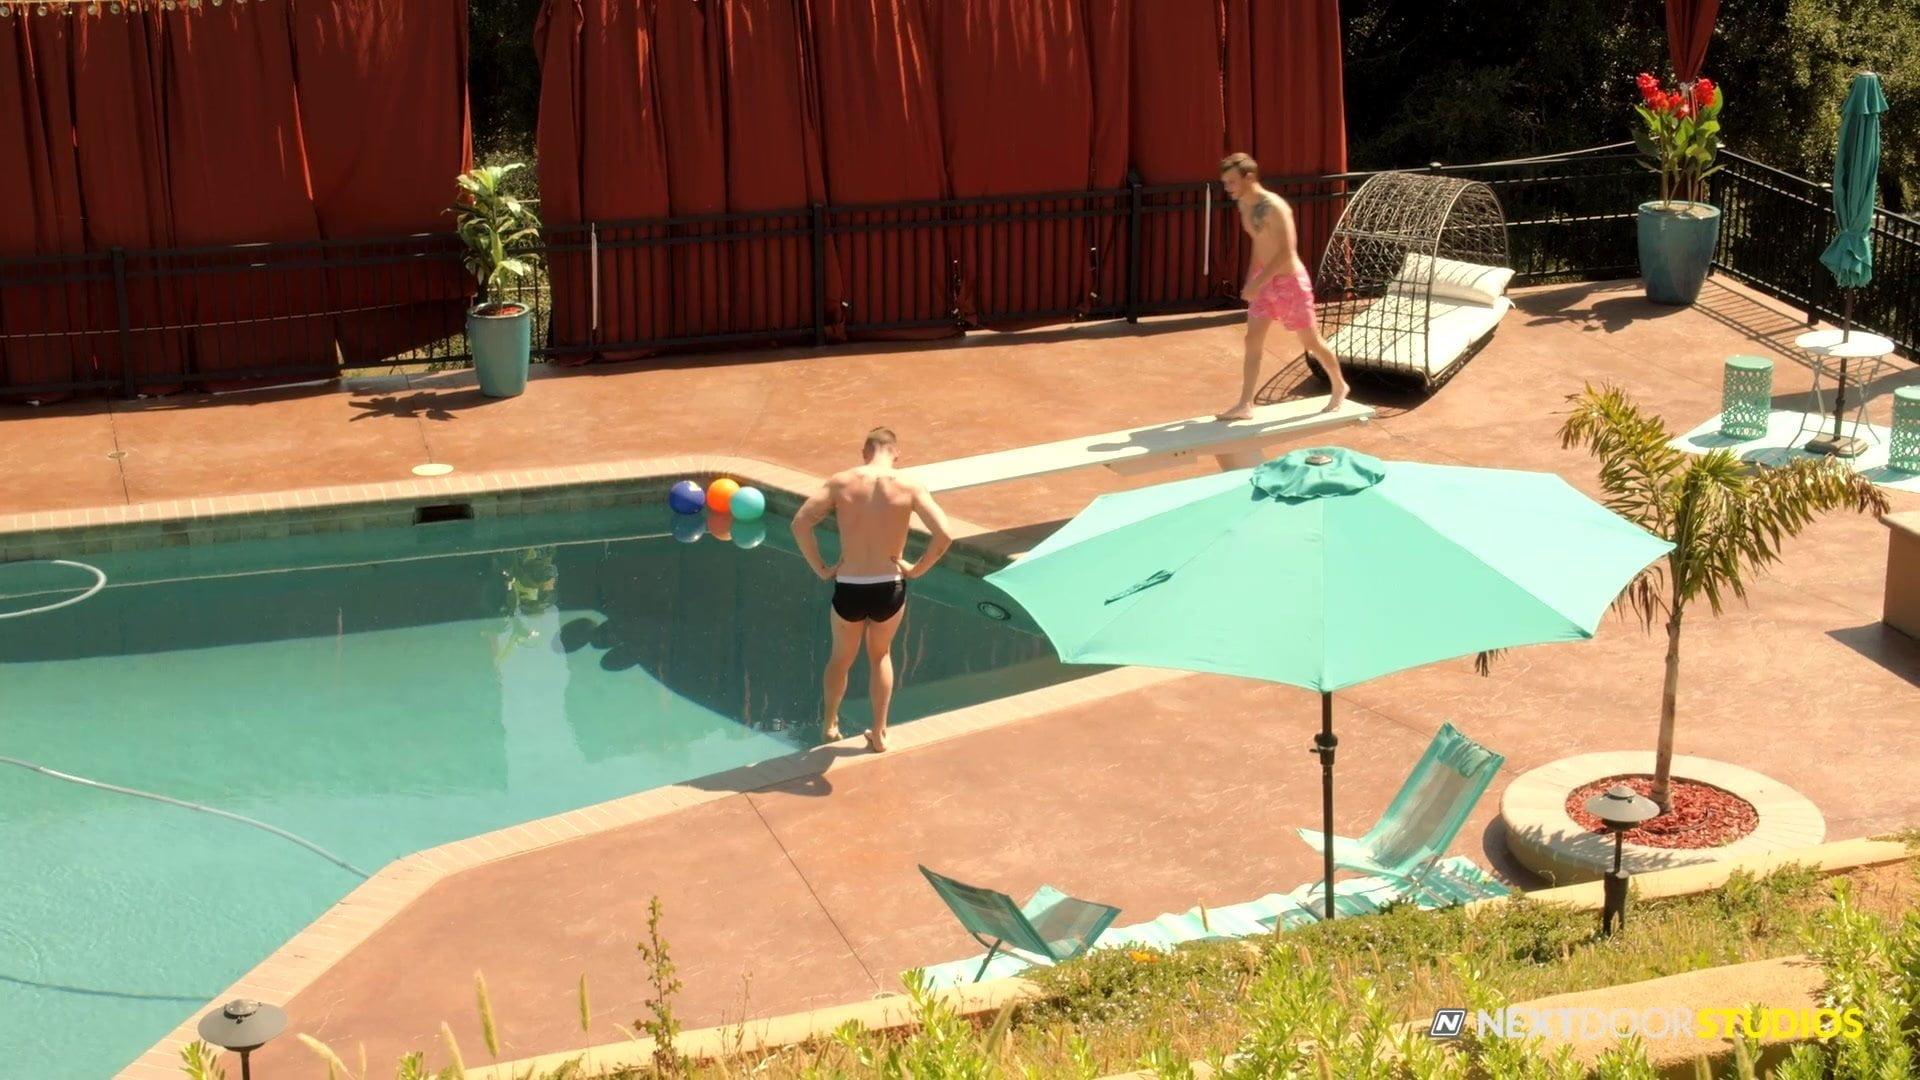 NextDoorStudios Spitroast By The Pool